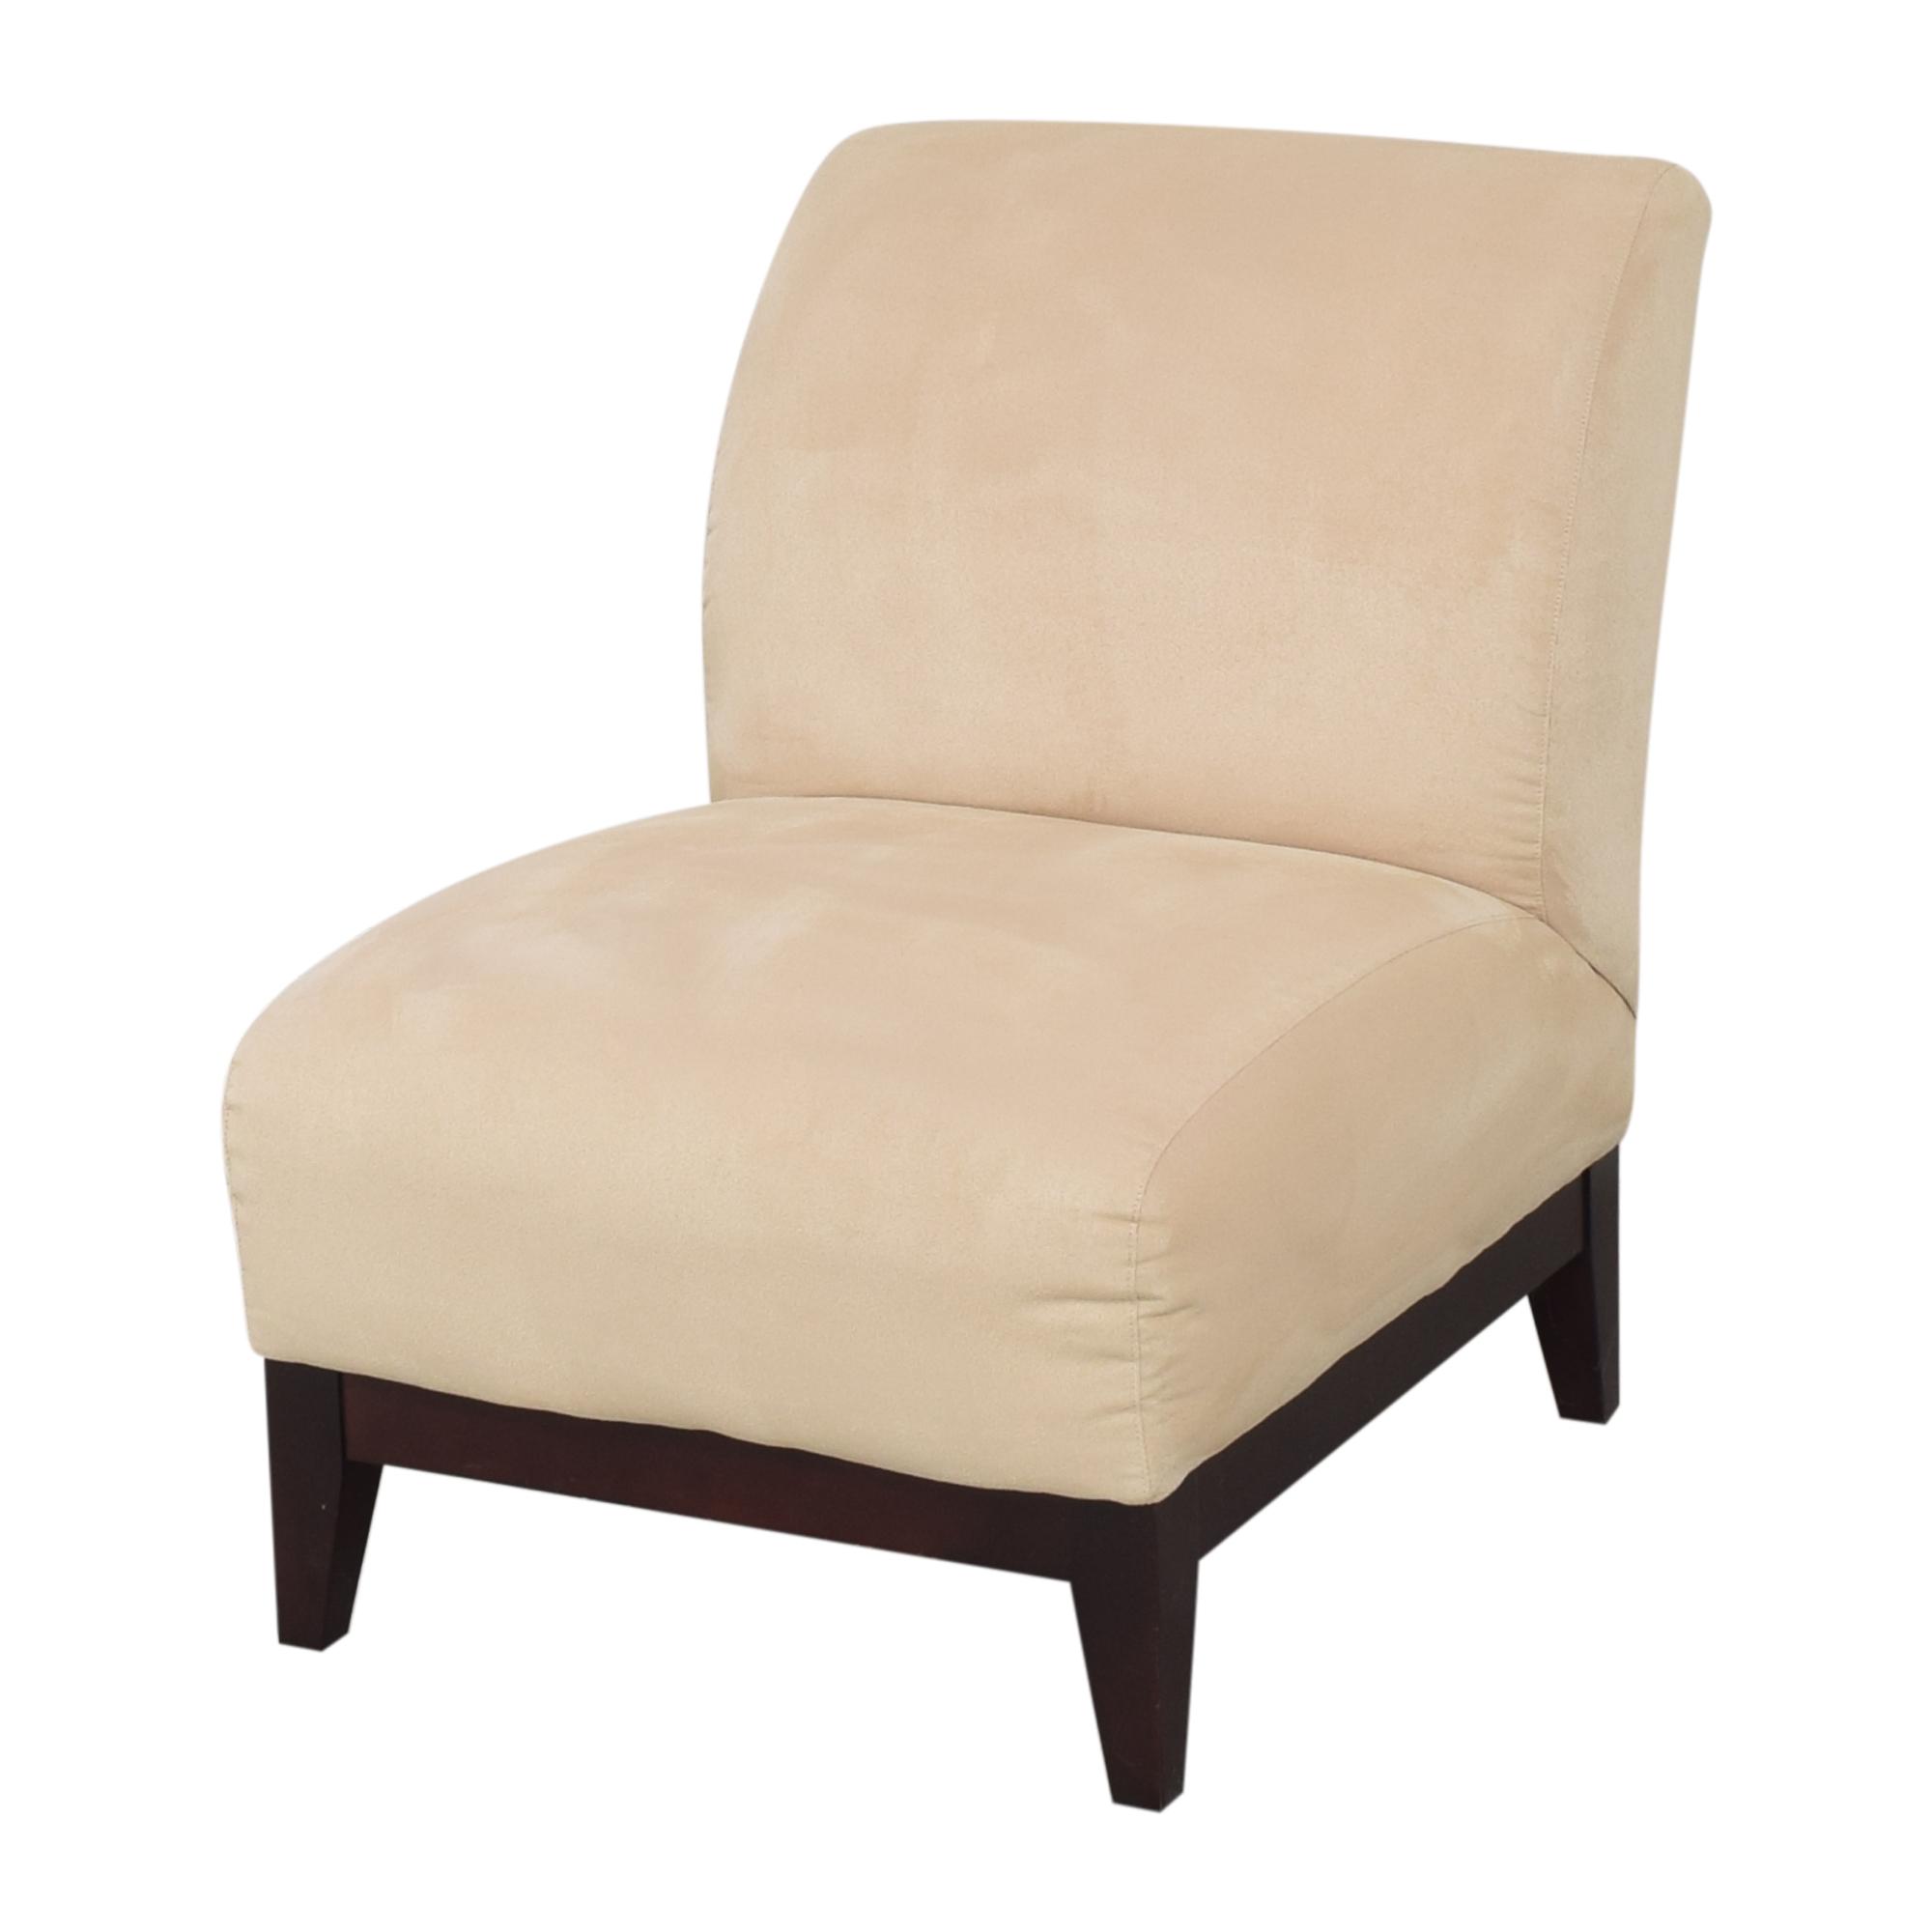 buy Mitchell Gold + Bob Williams Mitchell Gold + Bob Williams Slipper Chair online